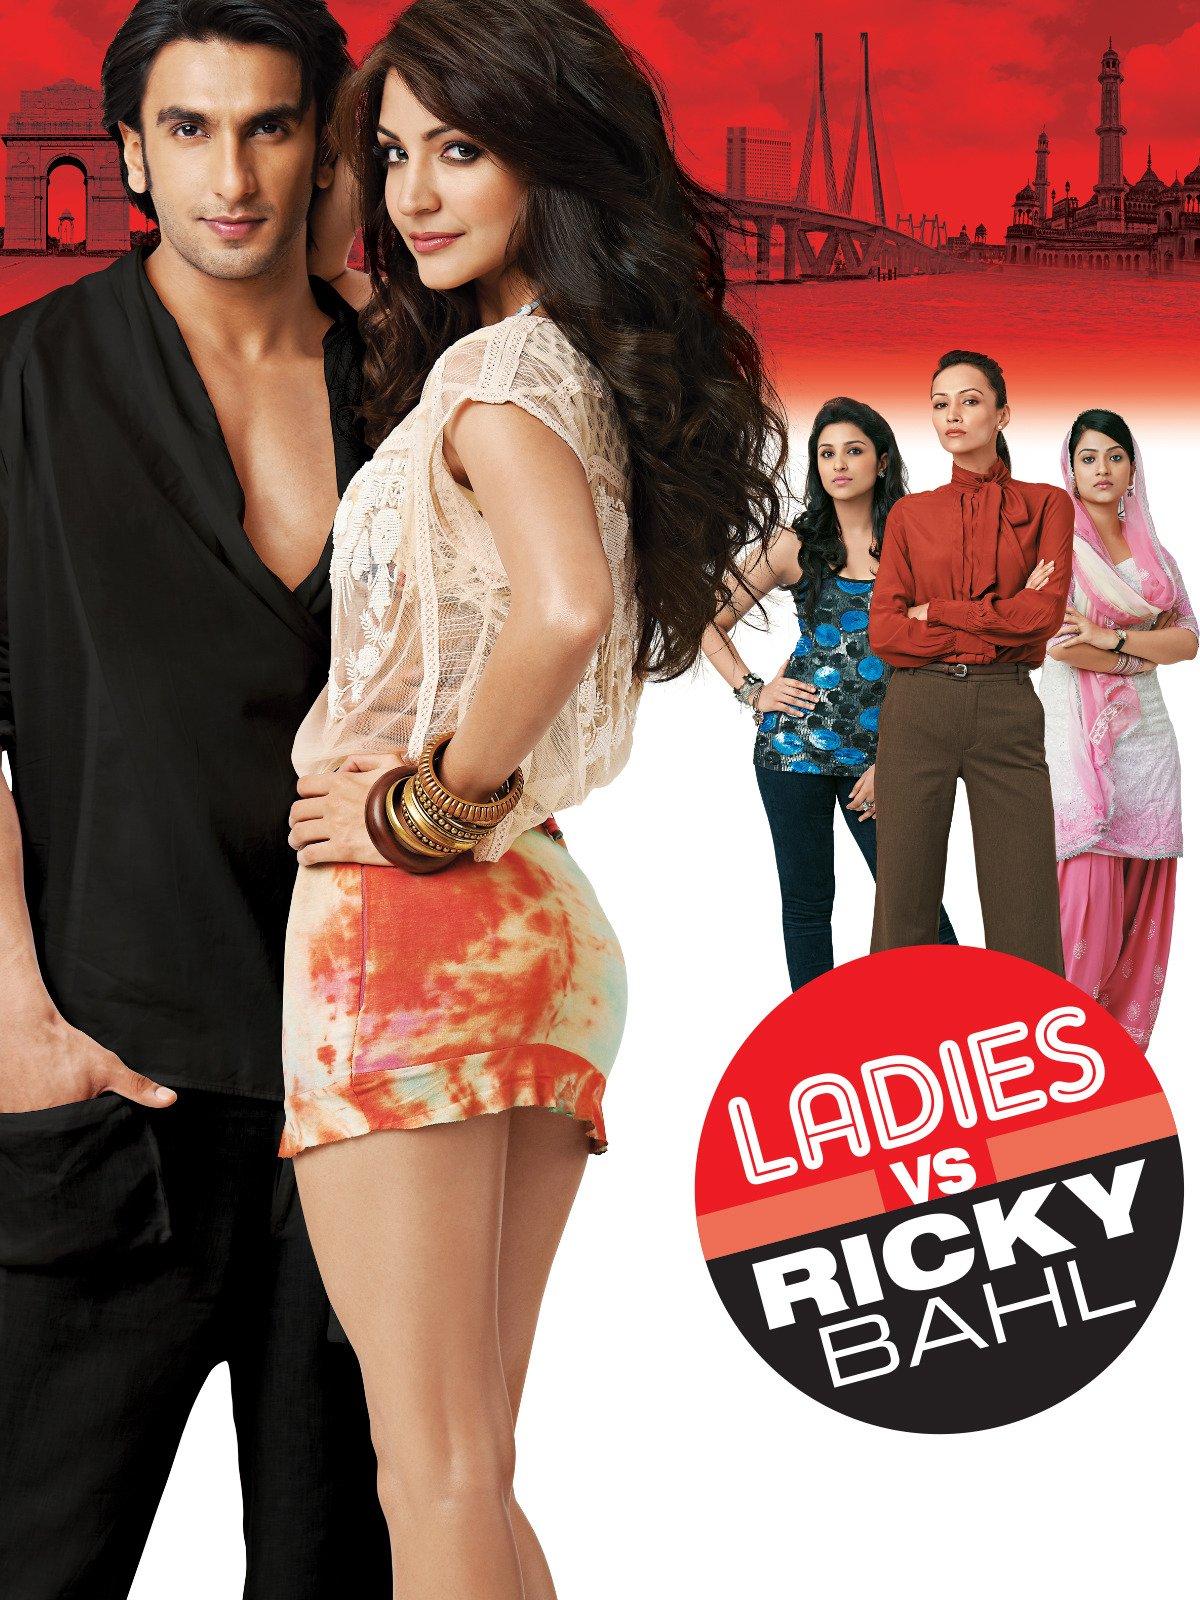 Ladies vs. Ricky Bahl on Amazon Prime Video UK